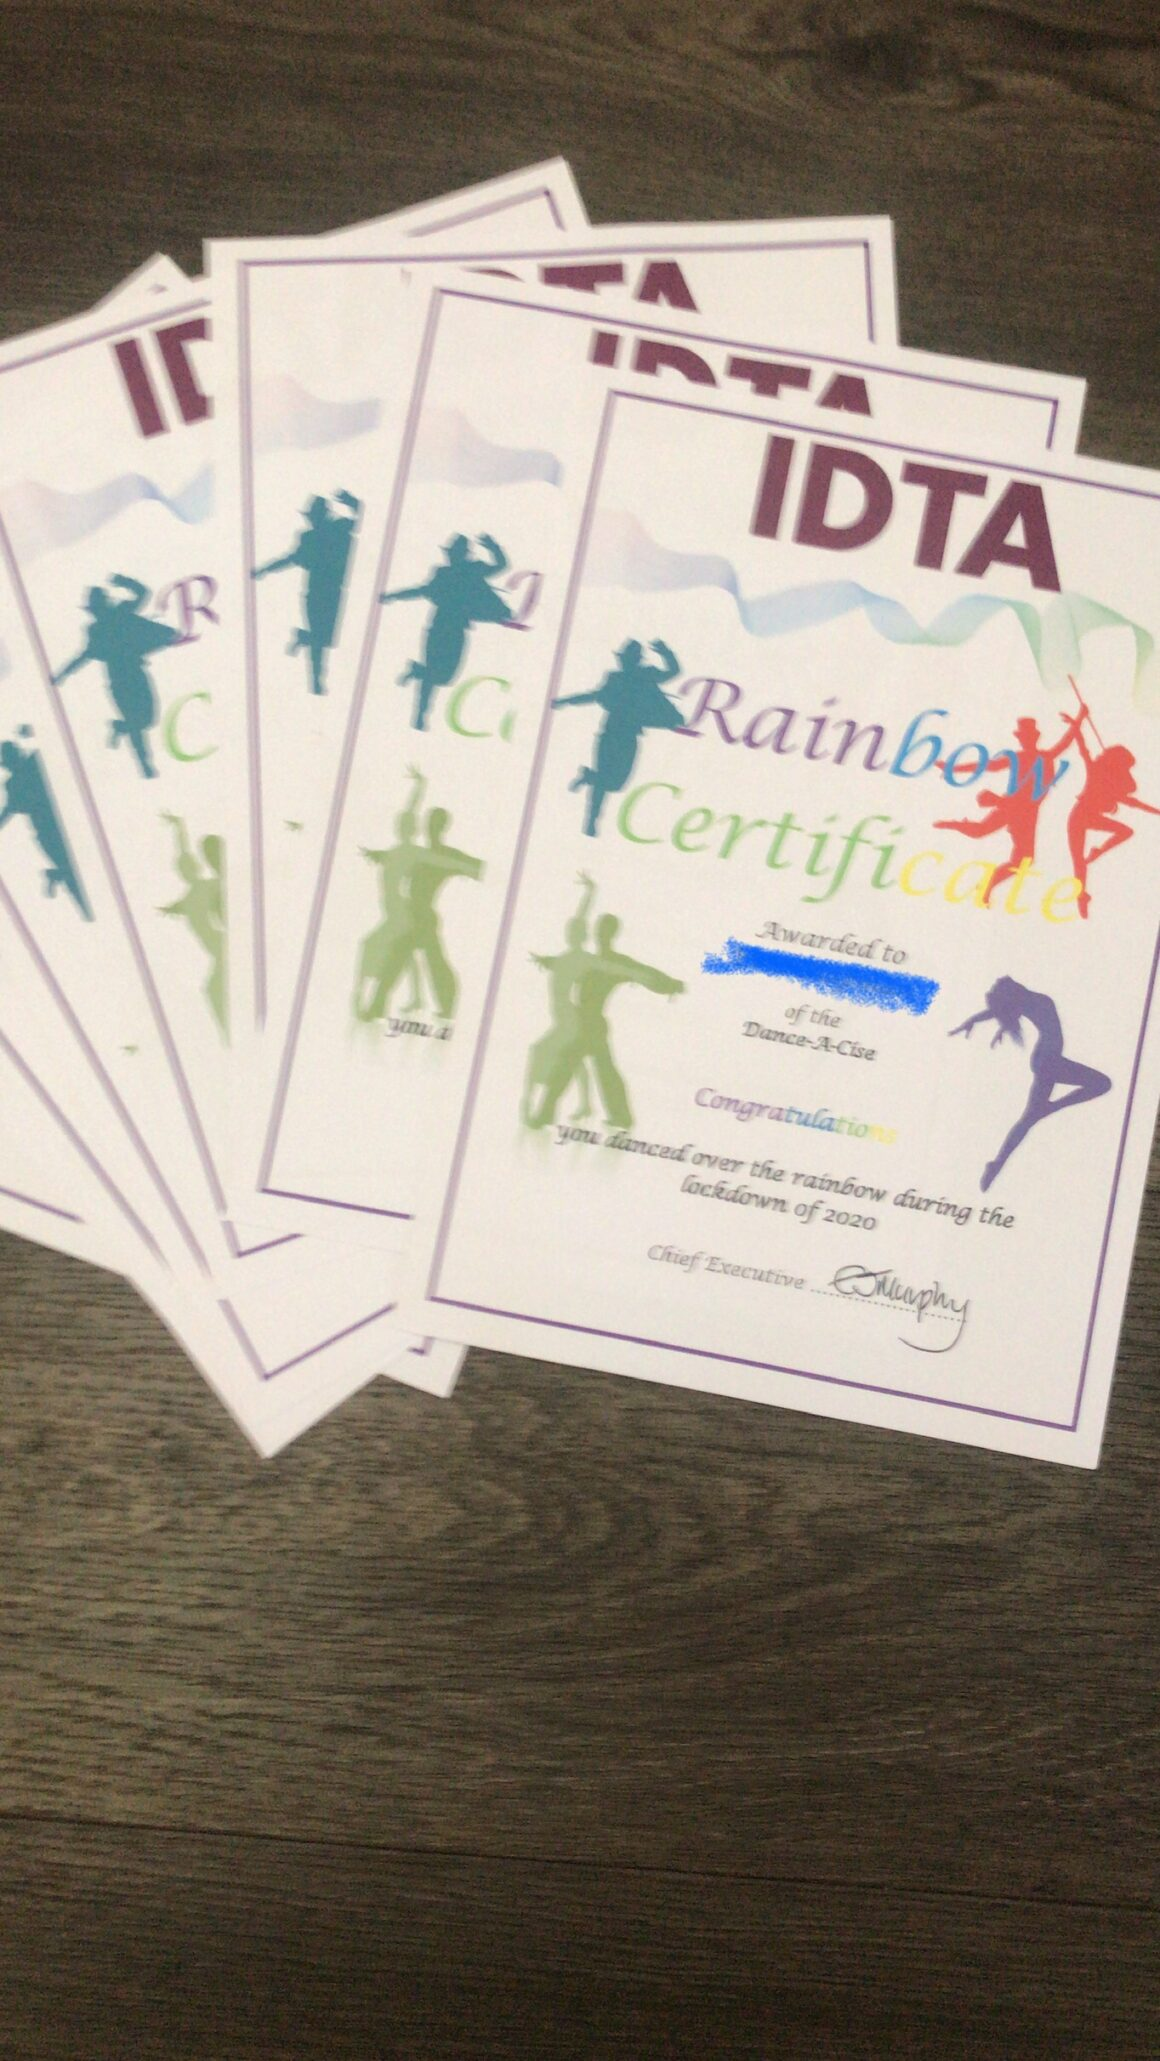 Thank you IDTA